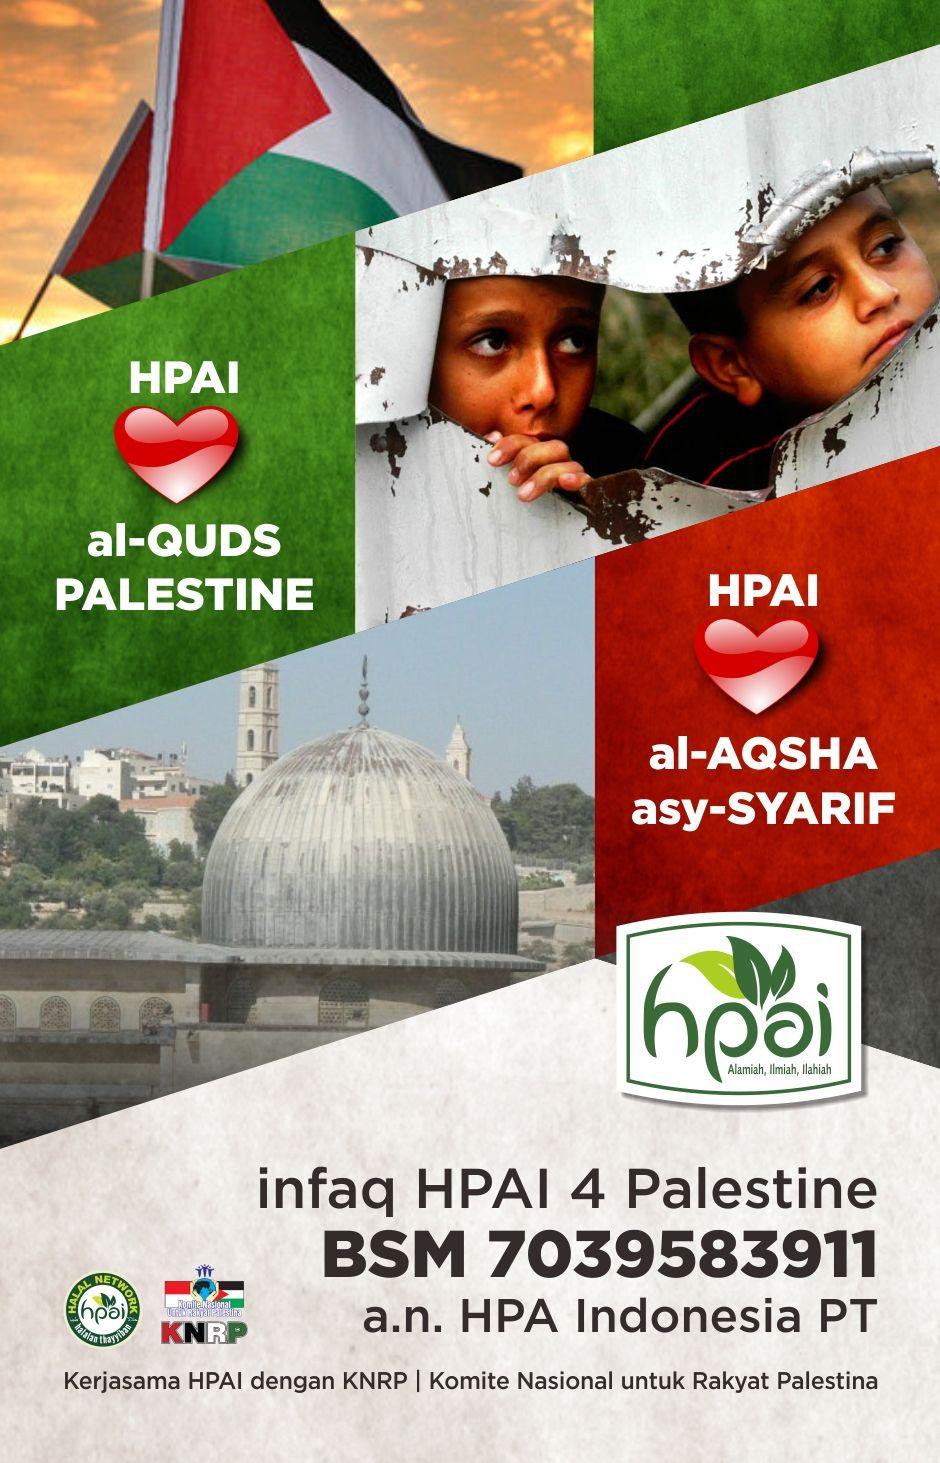 HPAI sahabat Palestina